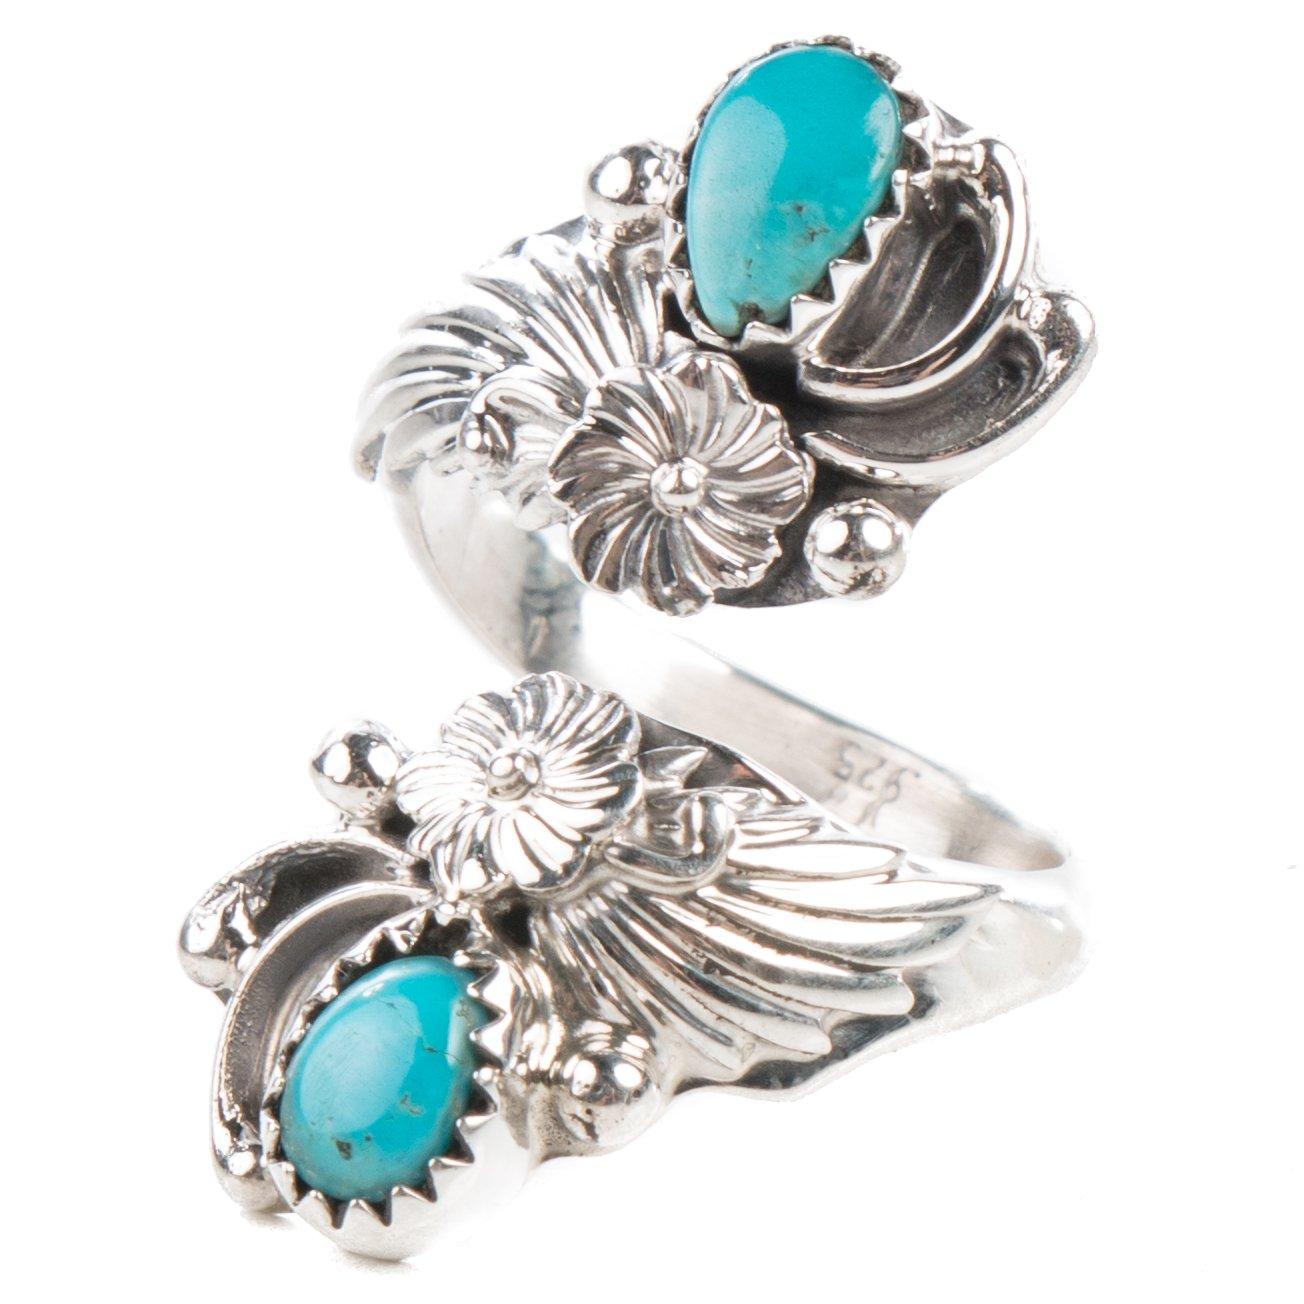 TSKIES Handmade Navajo Turquoise Sterling Silver Adjustable Ring Native American Jewelry Etta Belin TAR70501NAE Turquoise Skies